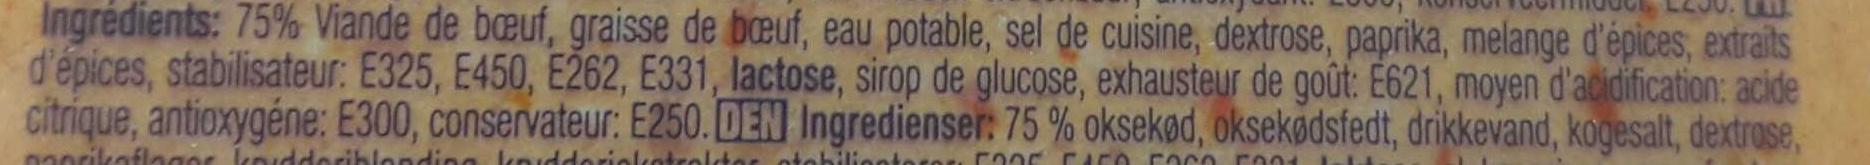 Biberli sigir salam dilimli - Ingrediënten